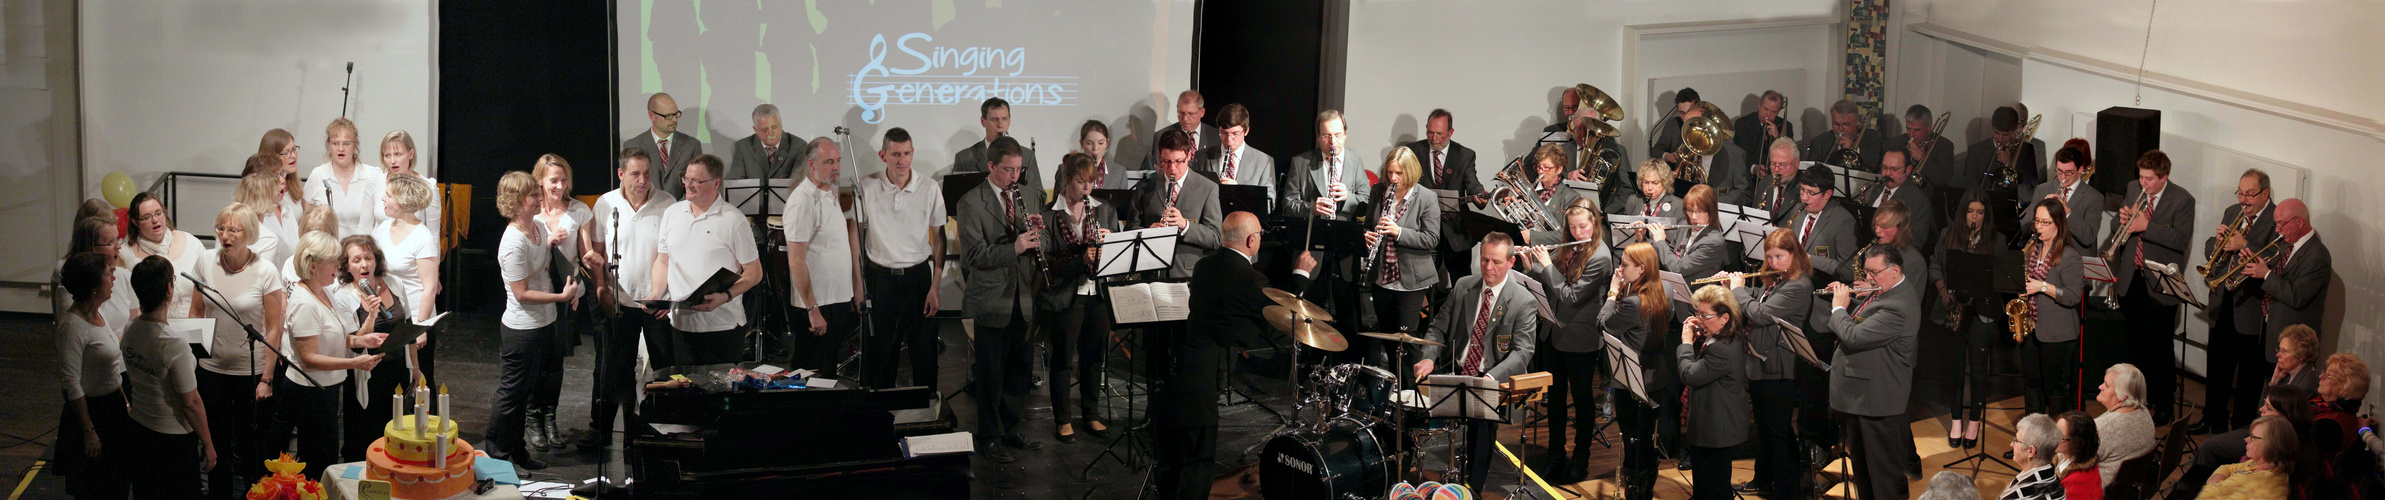 10 Jahre Singing Generations Hochheim am Main